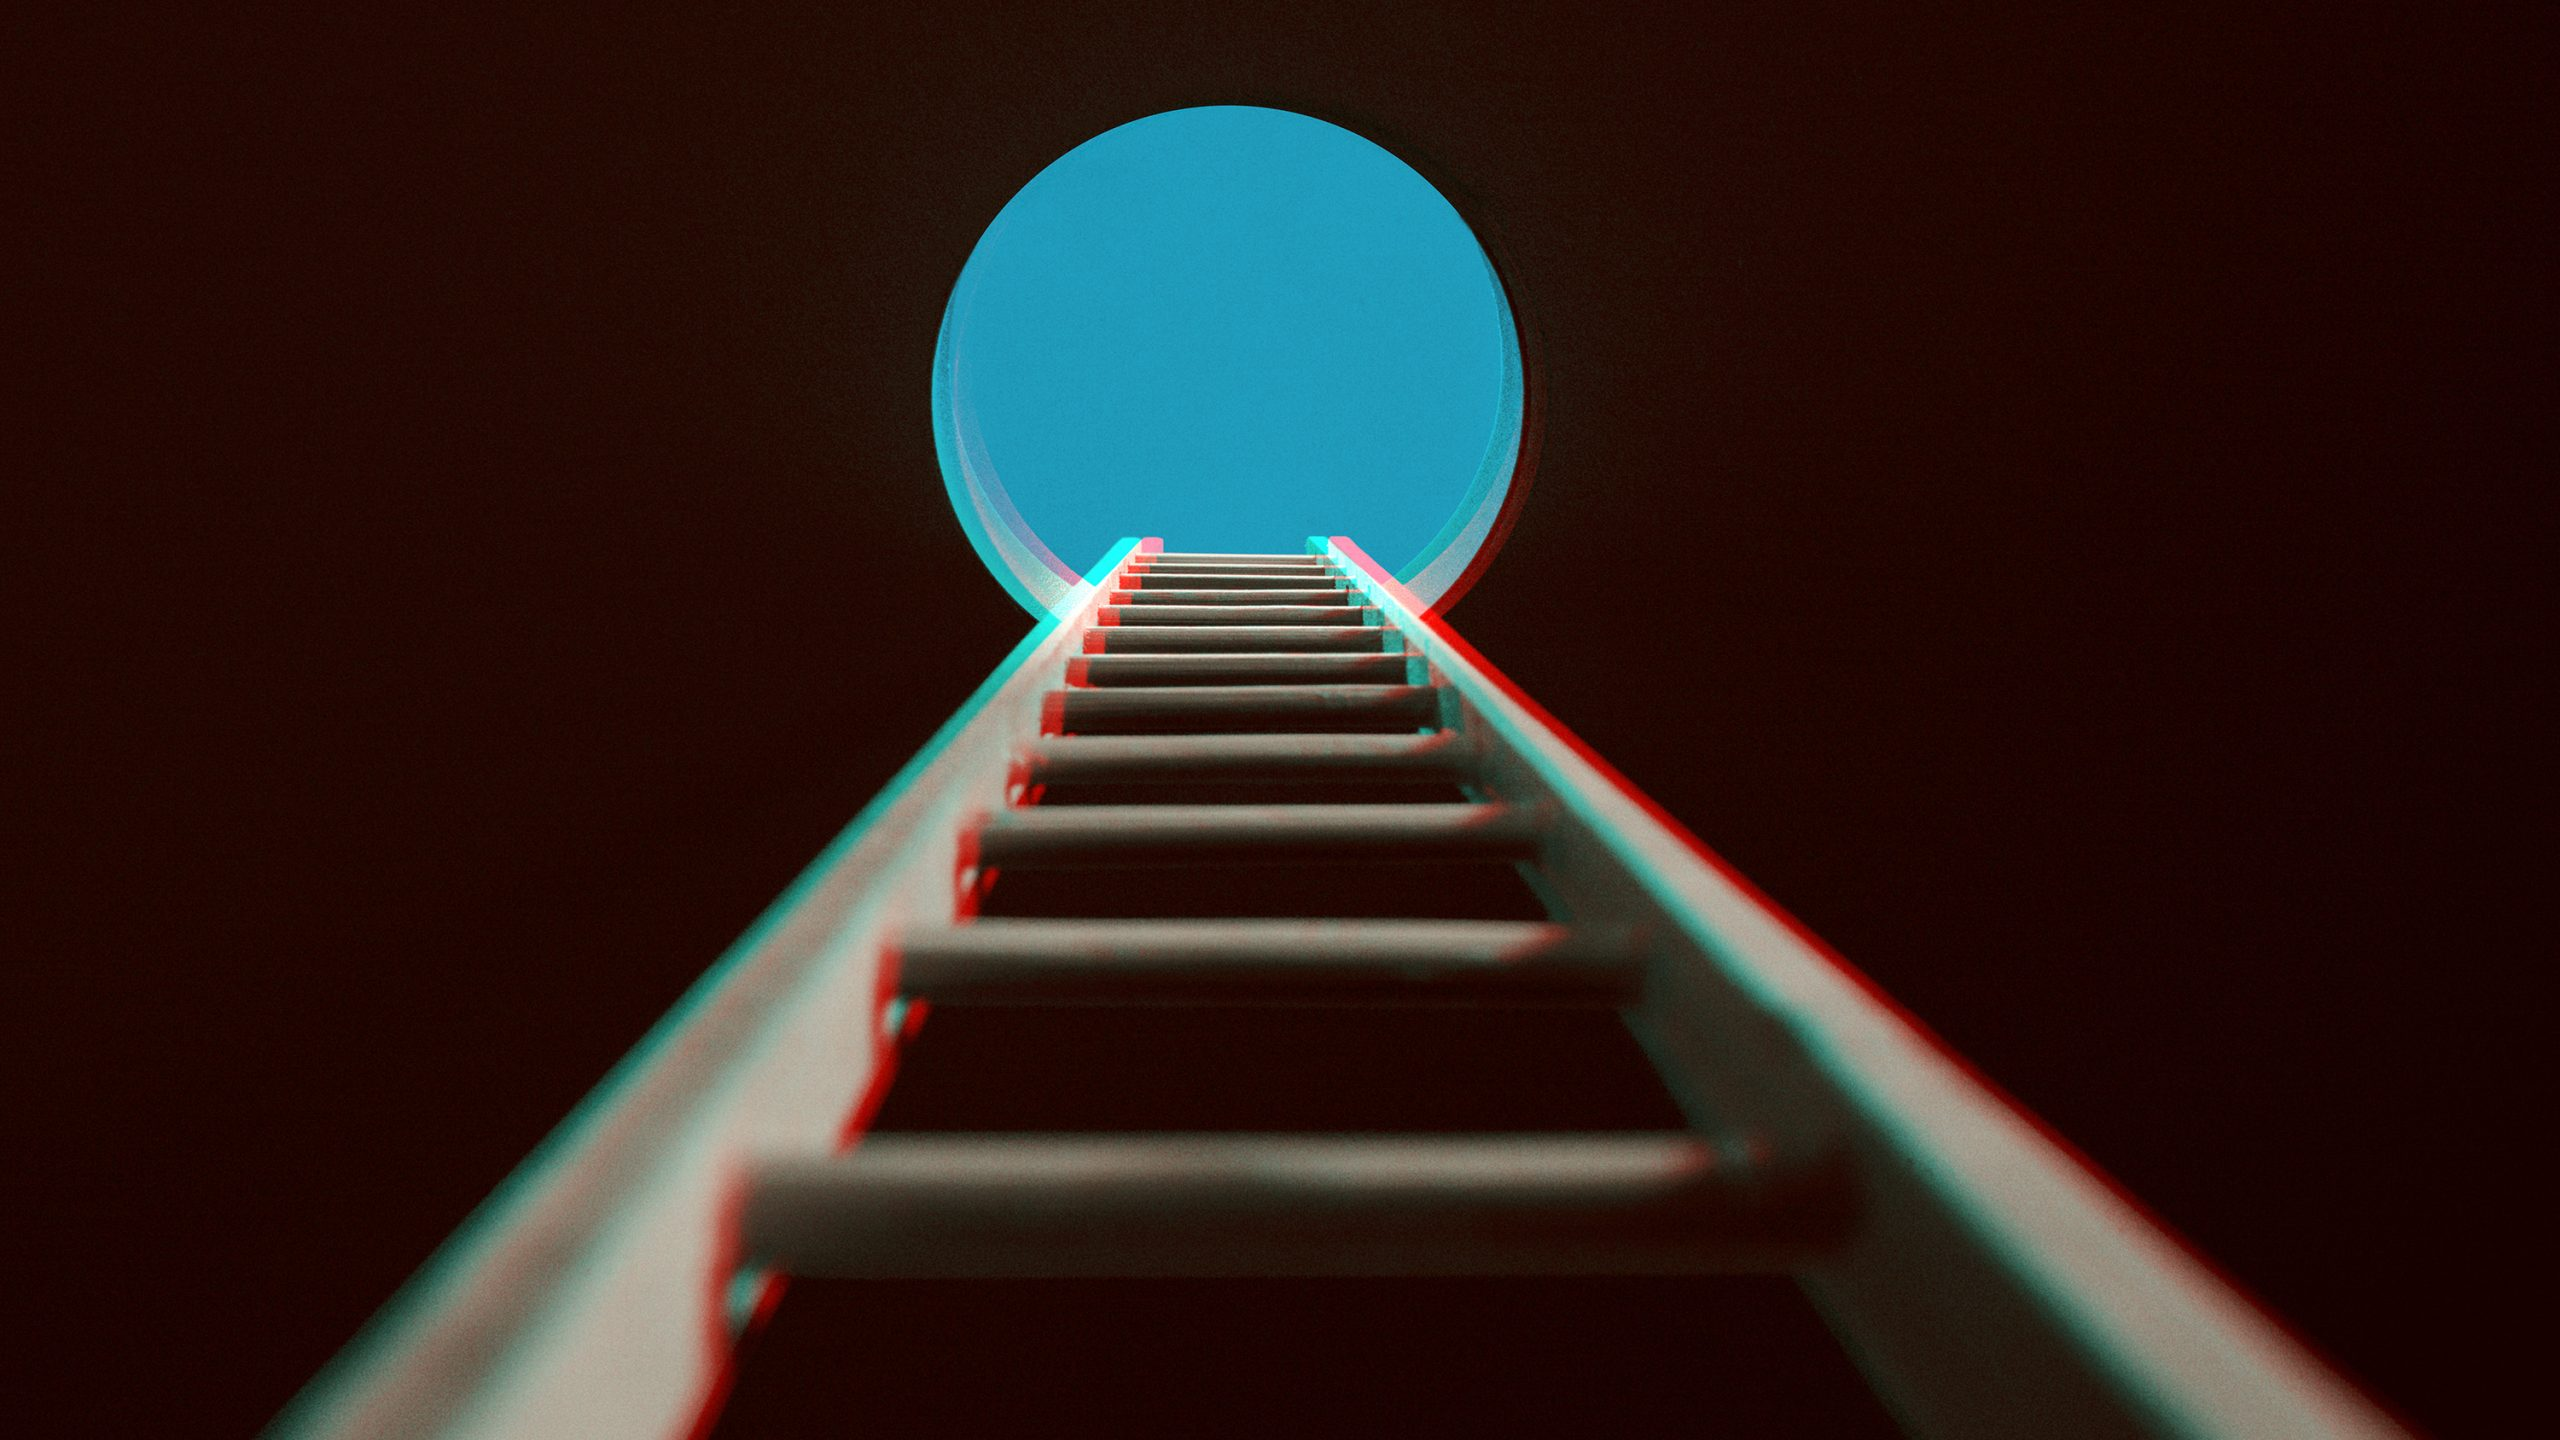 AI採用ツールの導入加速で、意図せぬ障害者排除の懸念